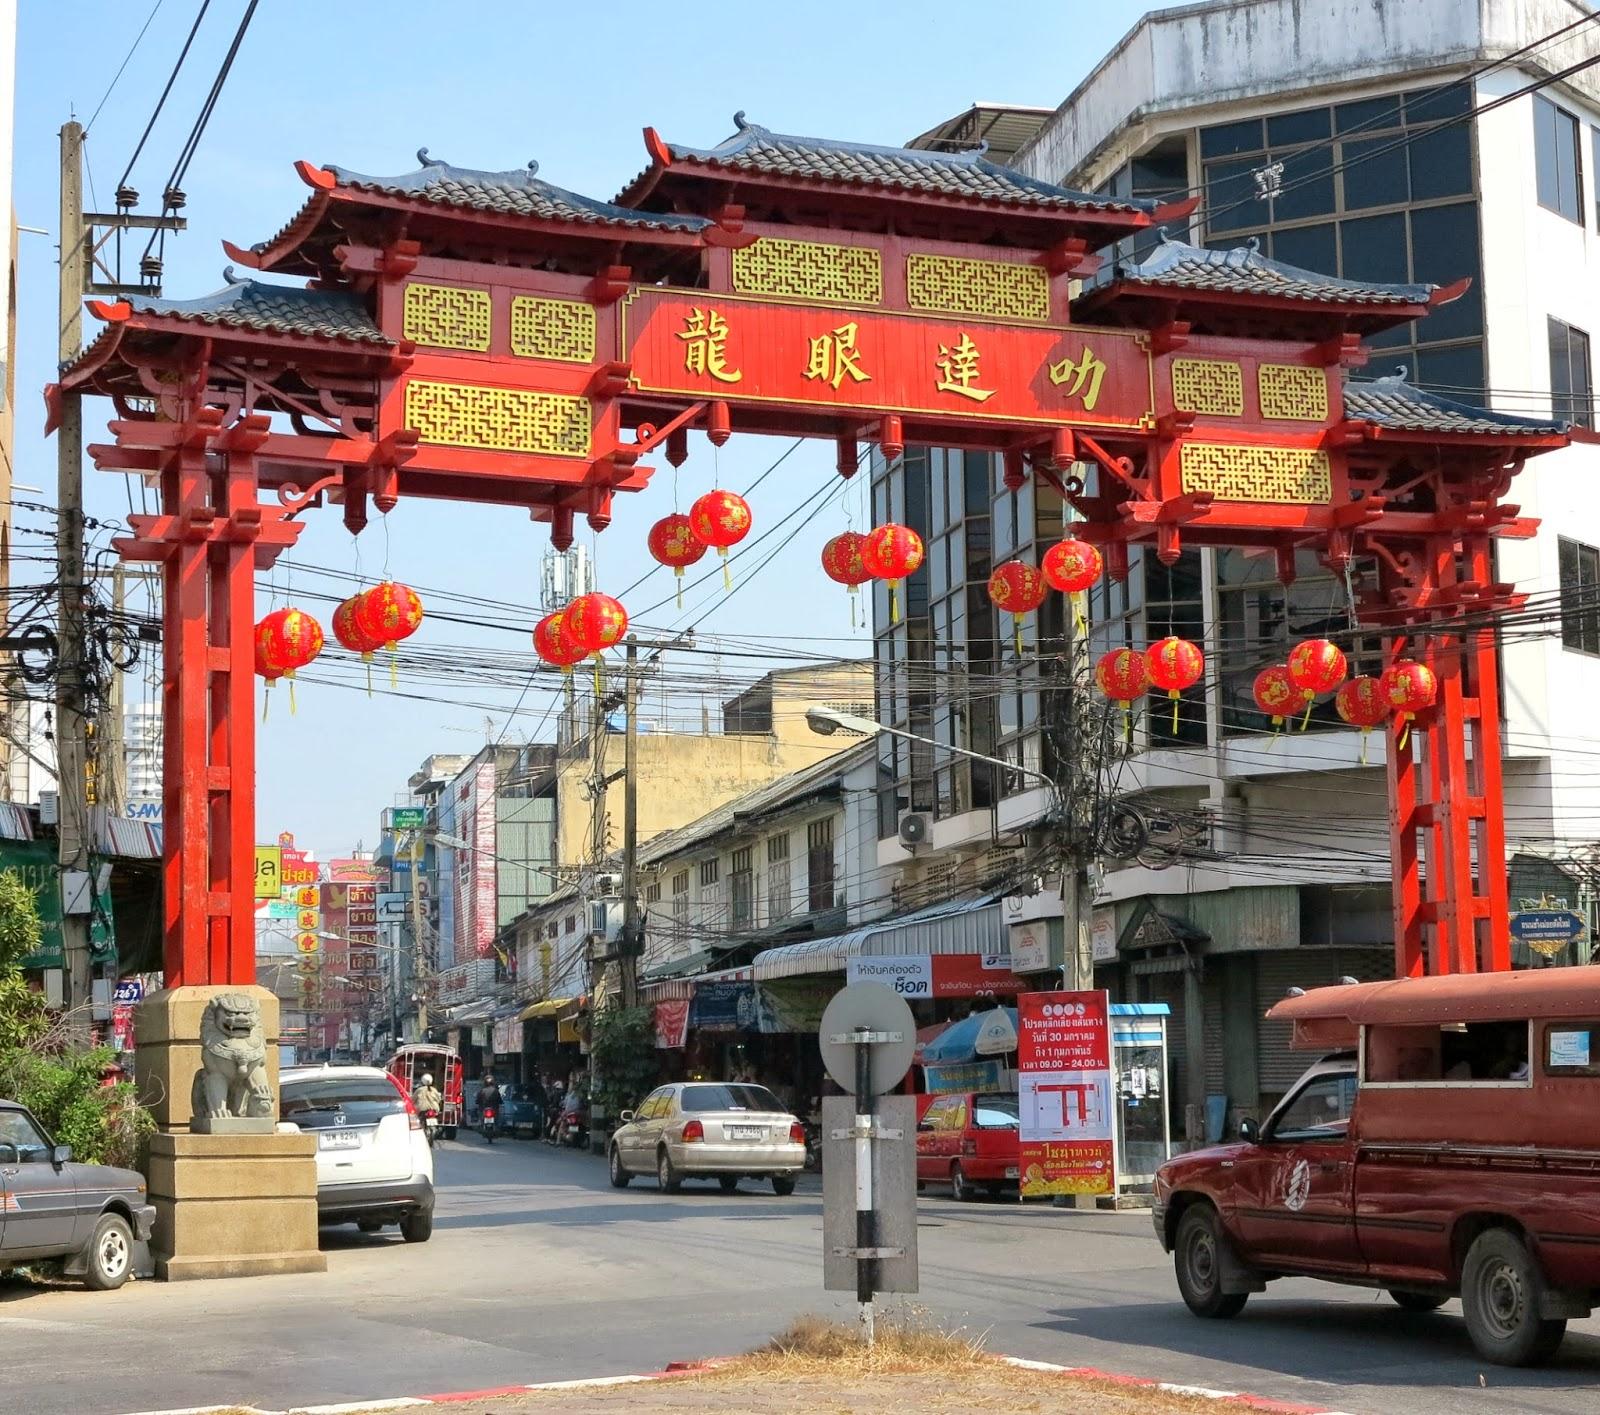 ByHaafner, China town